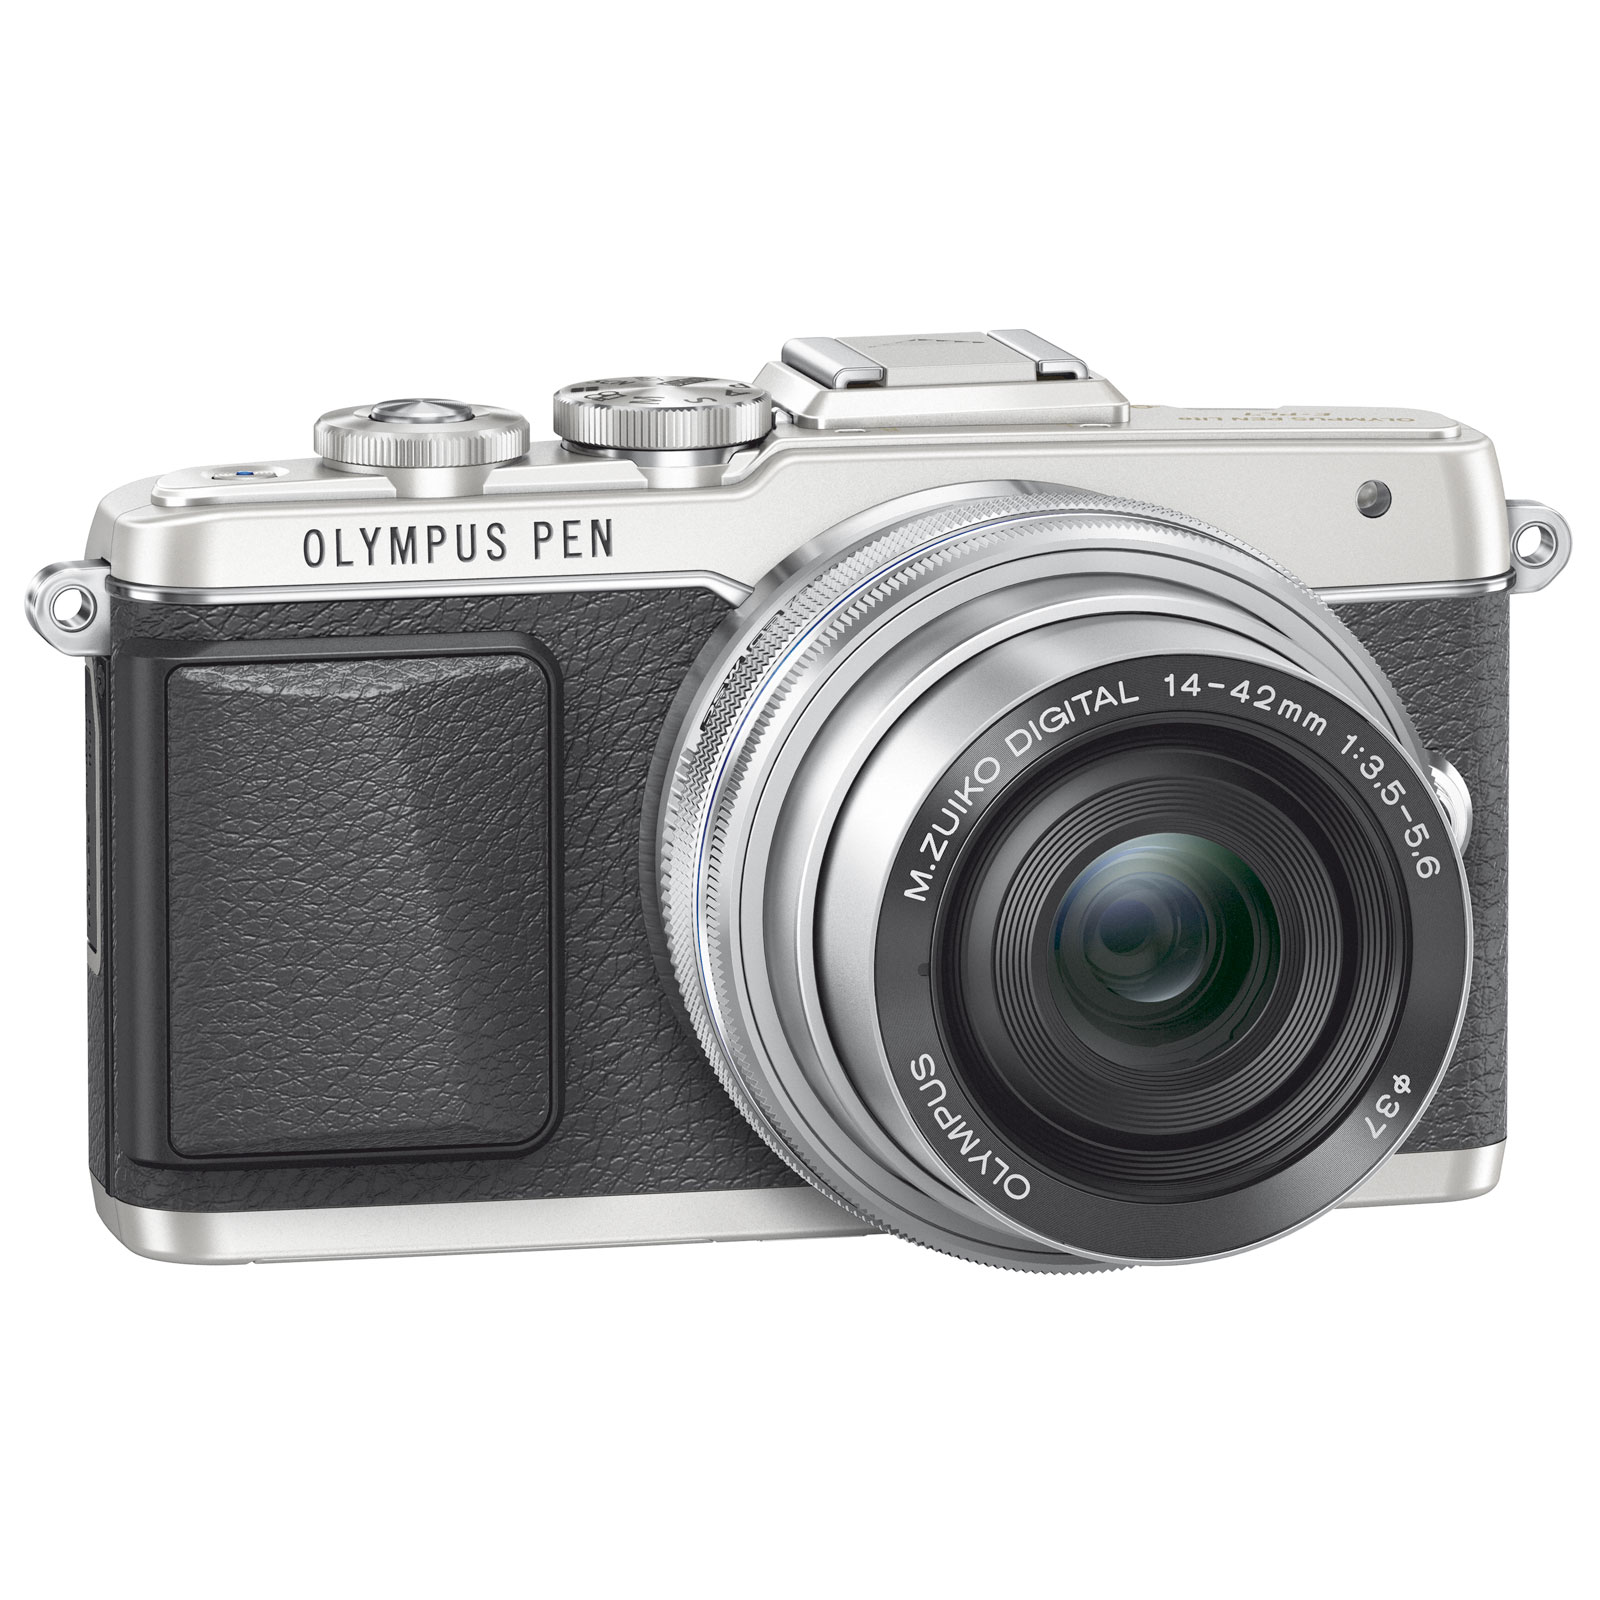 "Appareil photo hybride Olympus E-PL7 Argent + Objectif M.ZUIKO DIGITAL ED 14-42mm 1:3.5-5.6 EZ Pancake Argent Appareil photo hybride 16.1 MP - Ecran LCD tactile orientable 3"" - Vidéo Full HD - Wi-Fi"